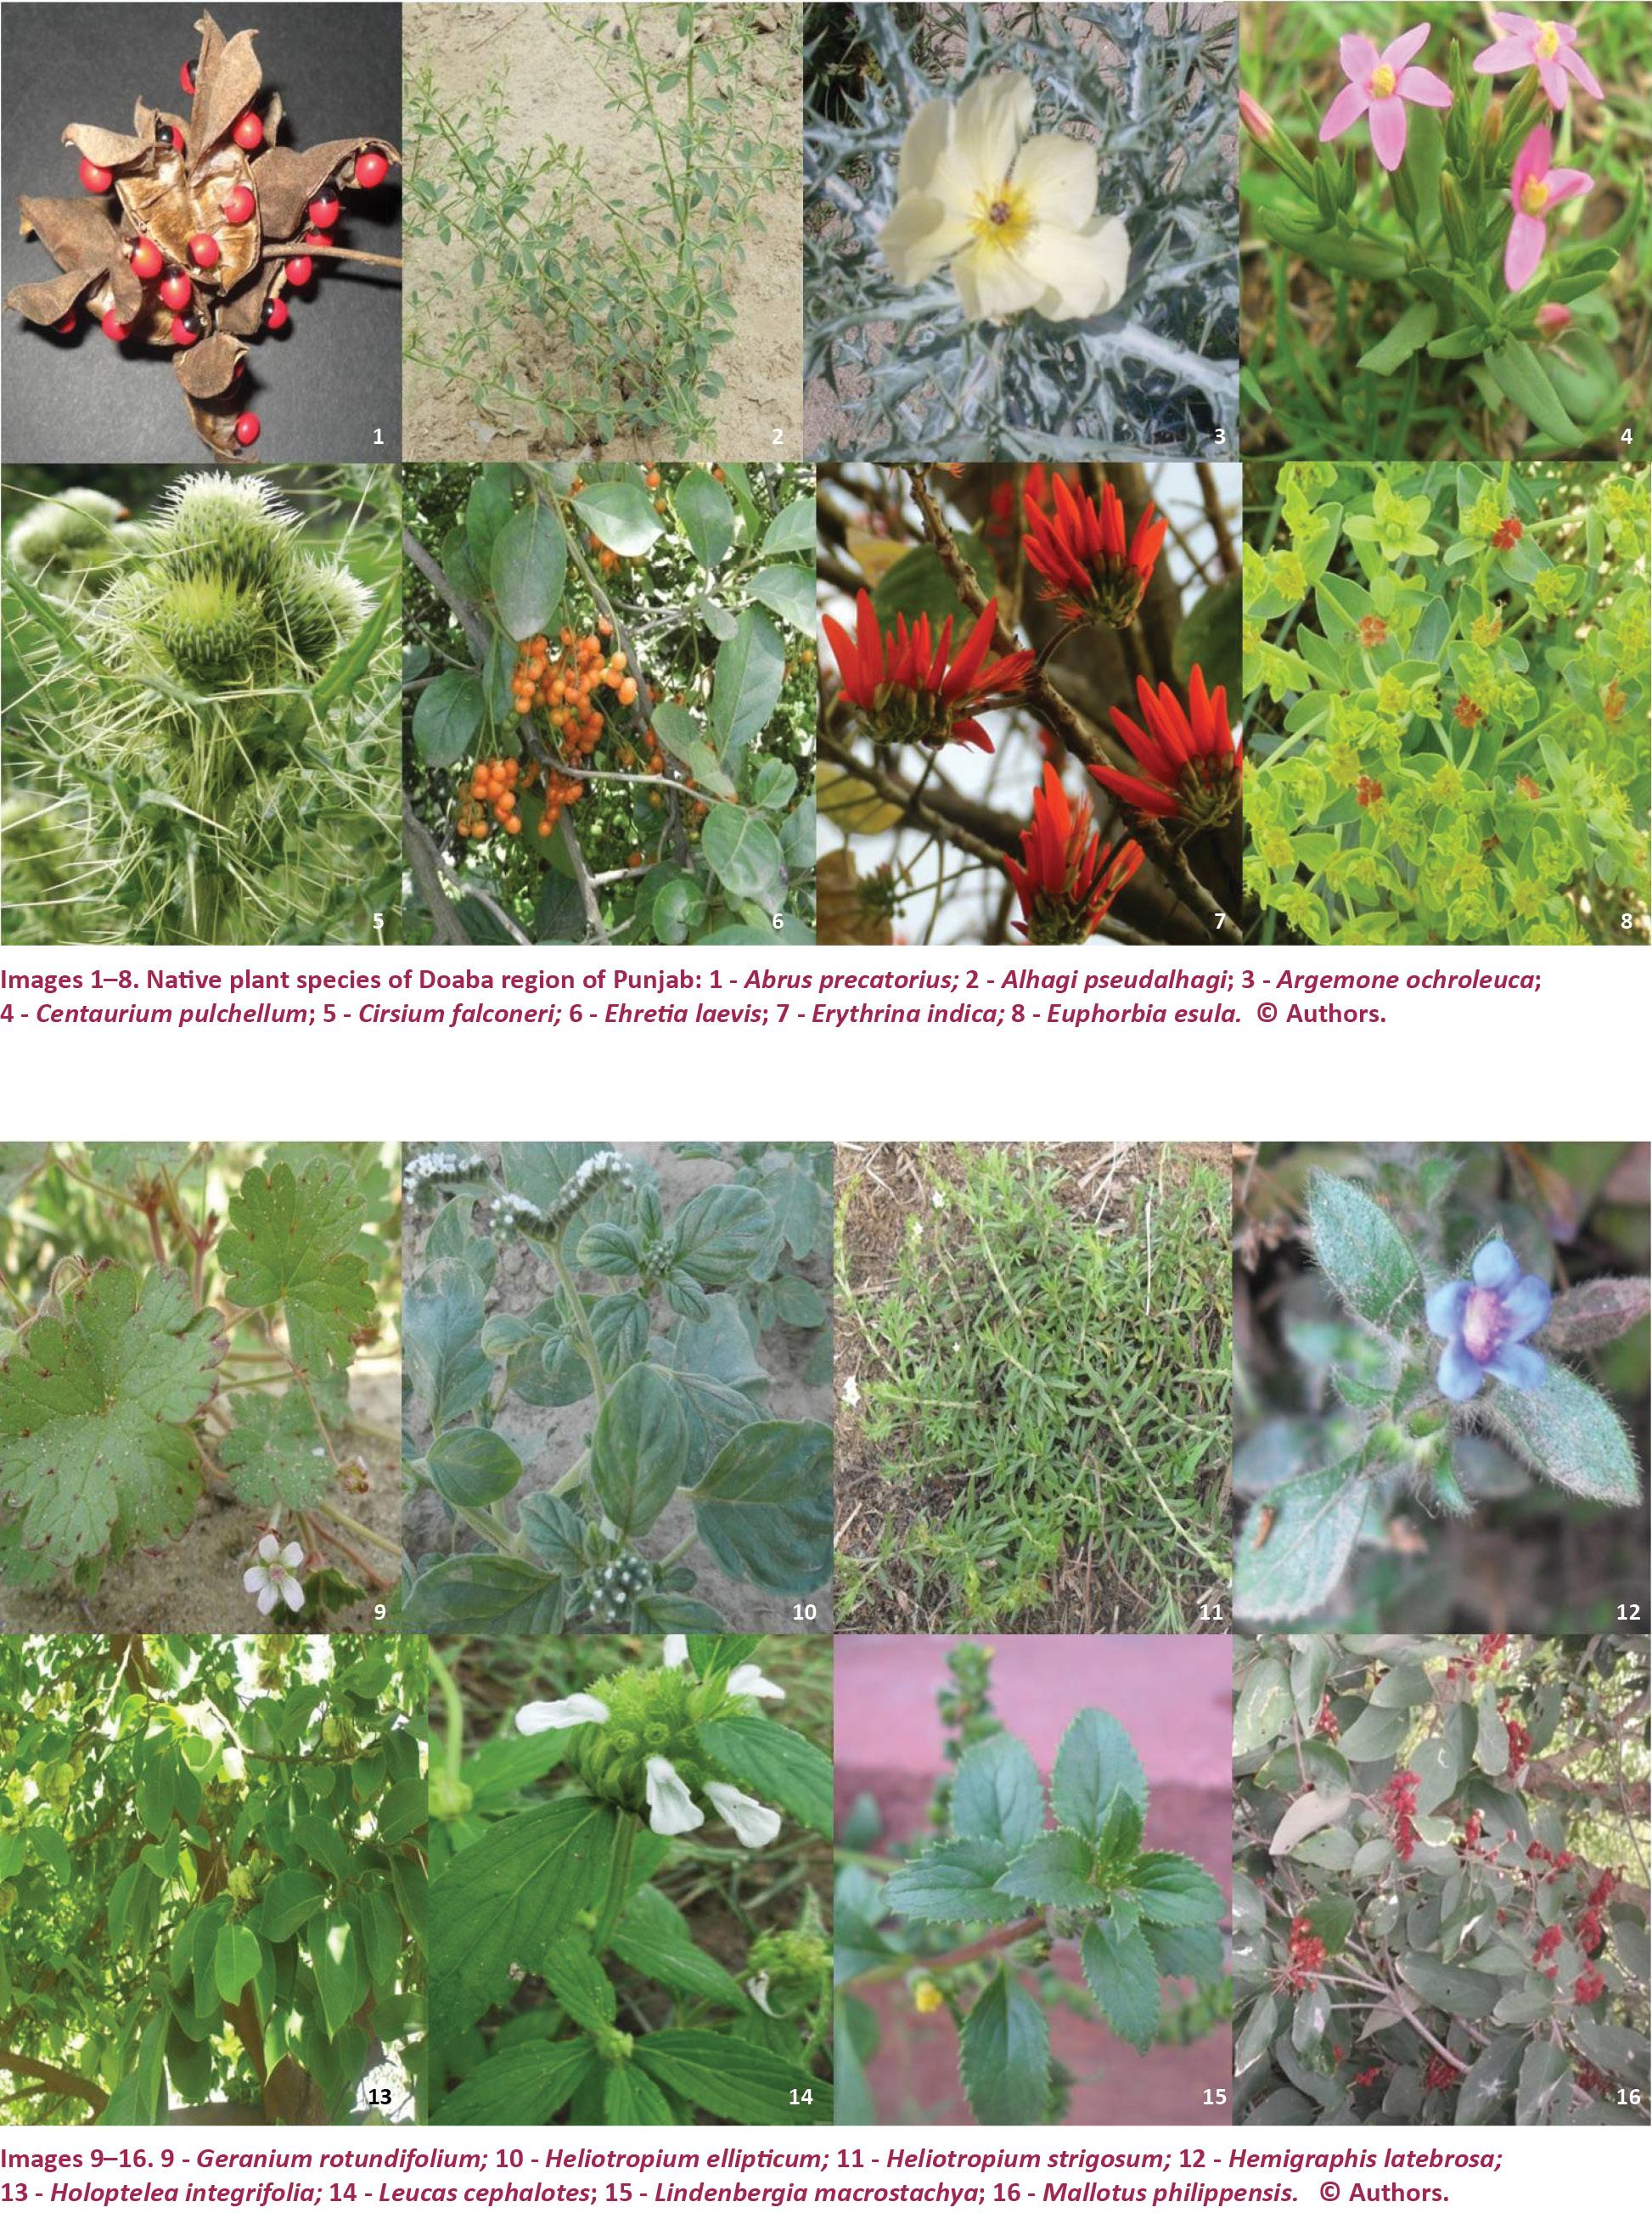 View of Angiosperm diversity in Doaba region of Punjab